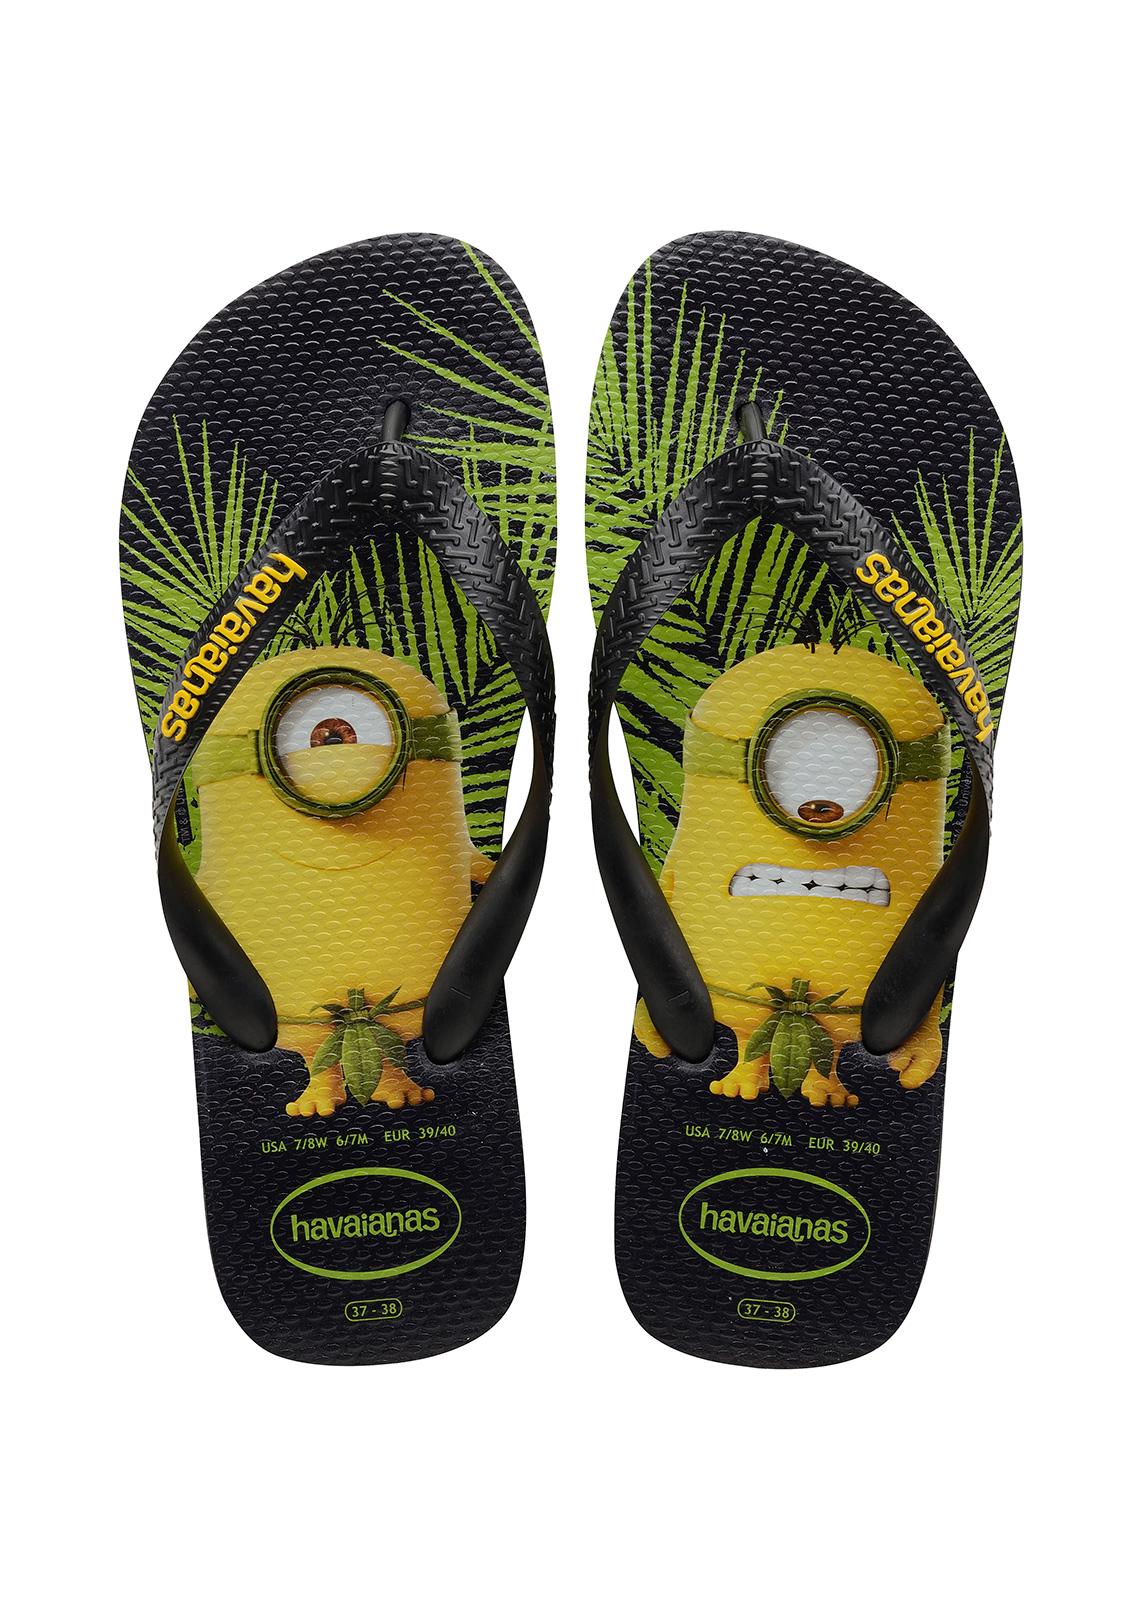 3de79b3817d1 Flip-Flops Black Flip Flops - Havaianas Minions Black